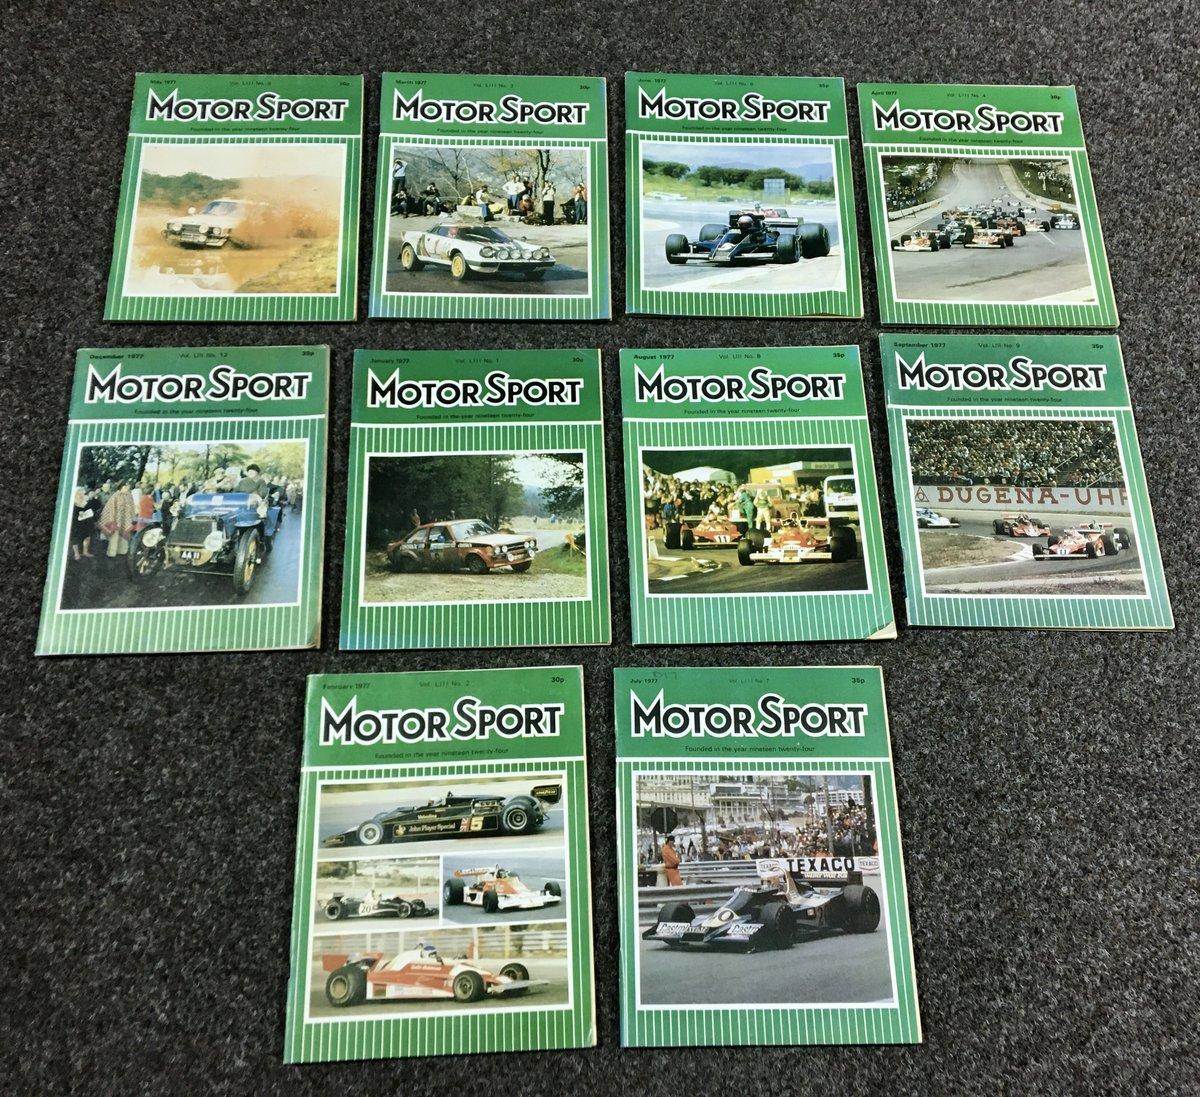 1970 Motor Sport Magazines - Fantastic Condition & Original For Sale (picture 3 of 6)